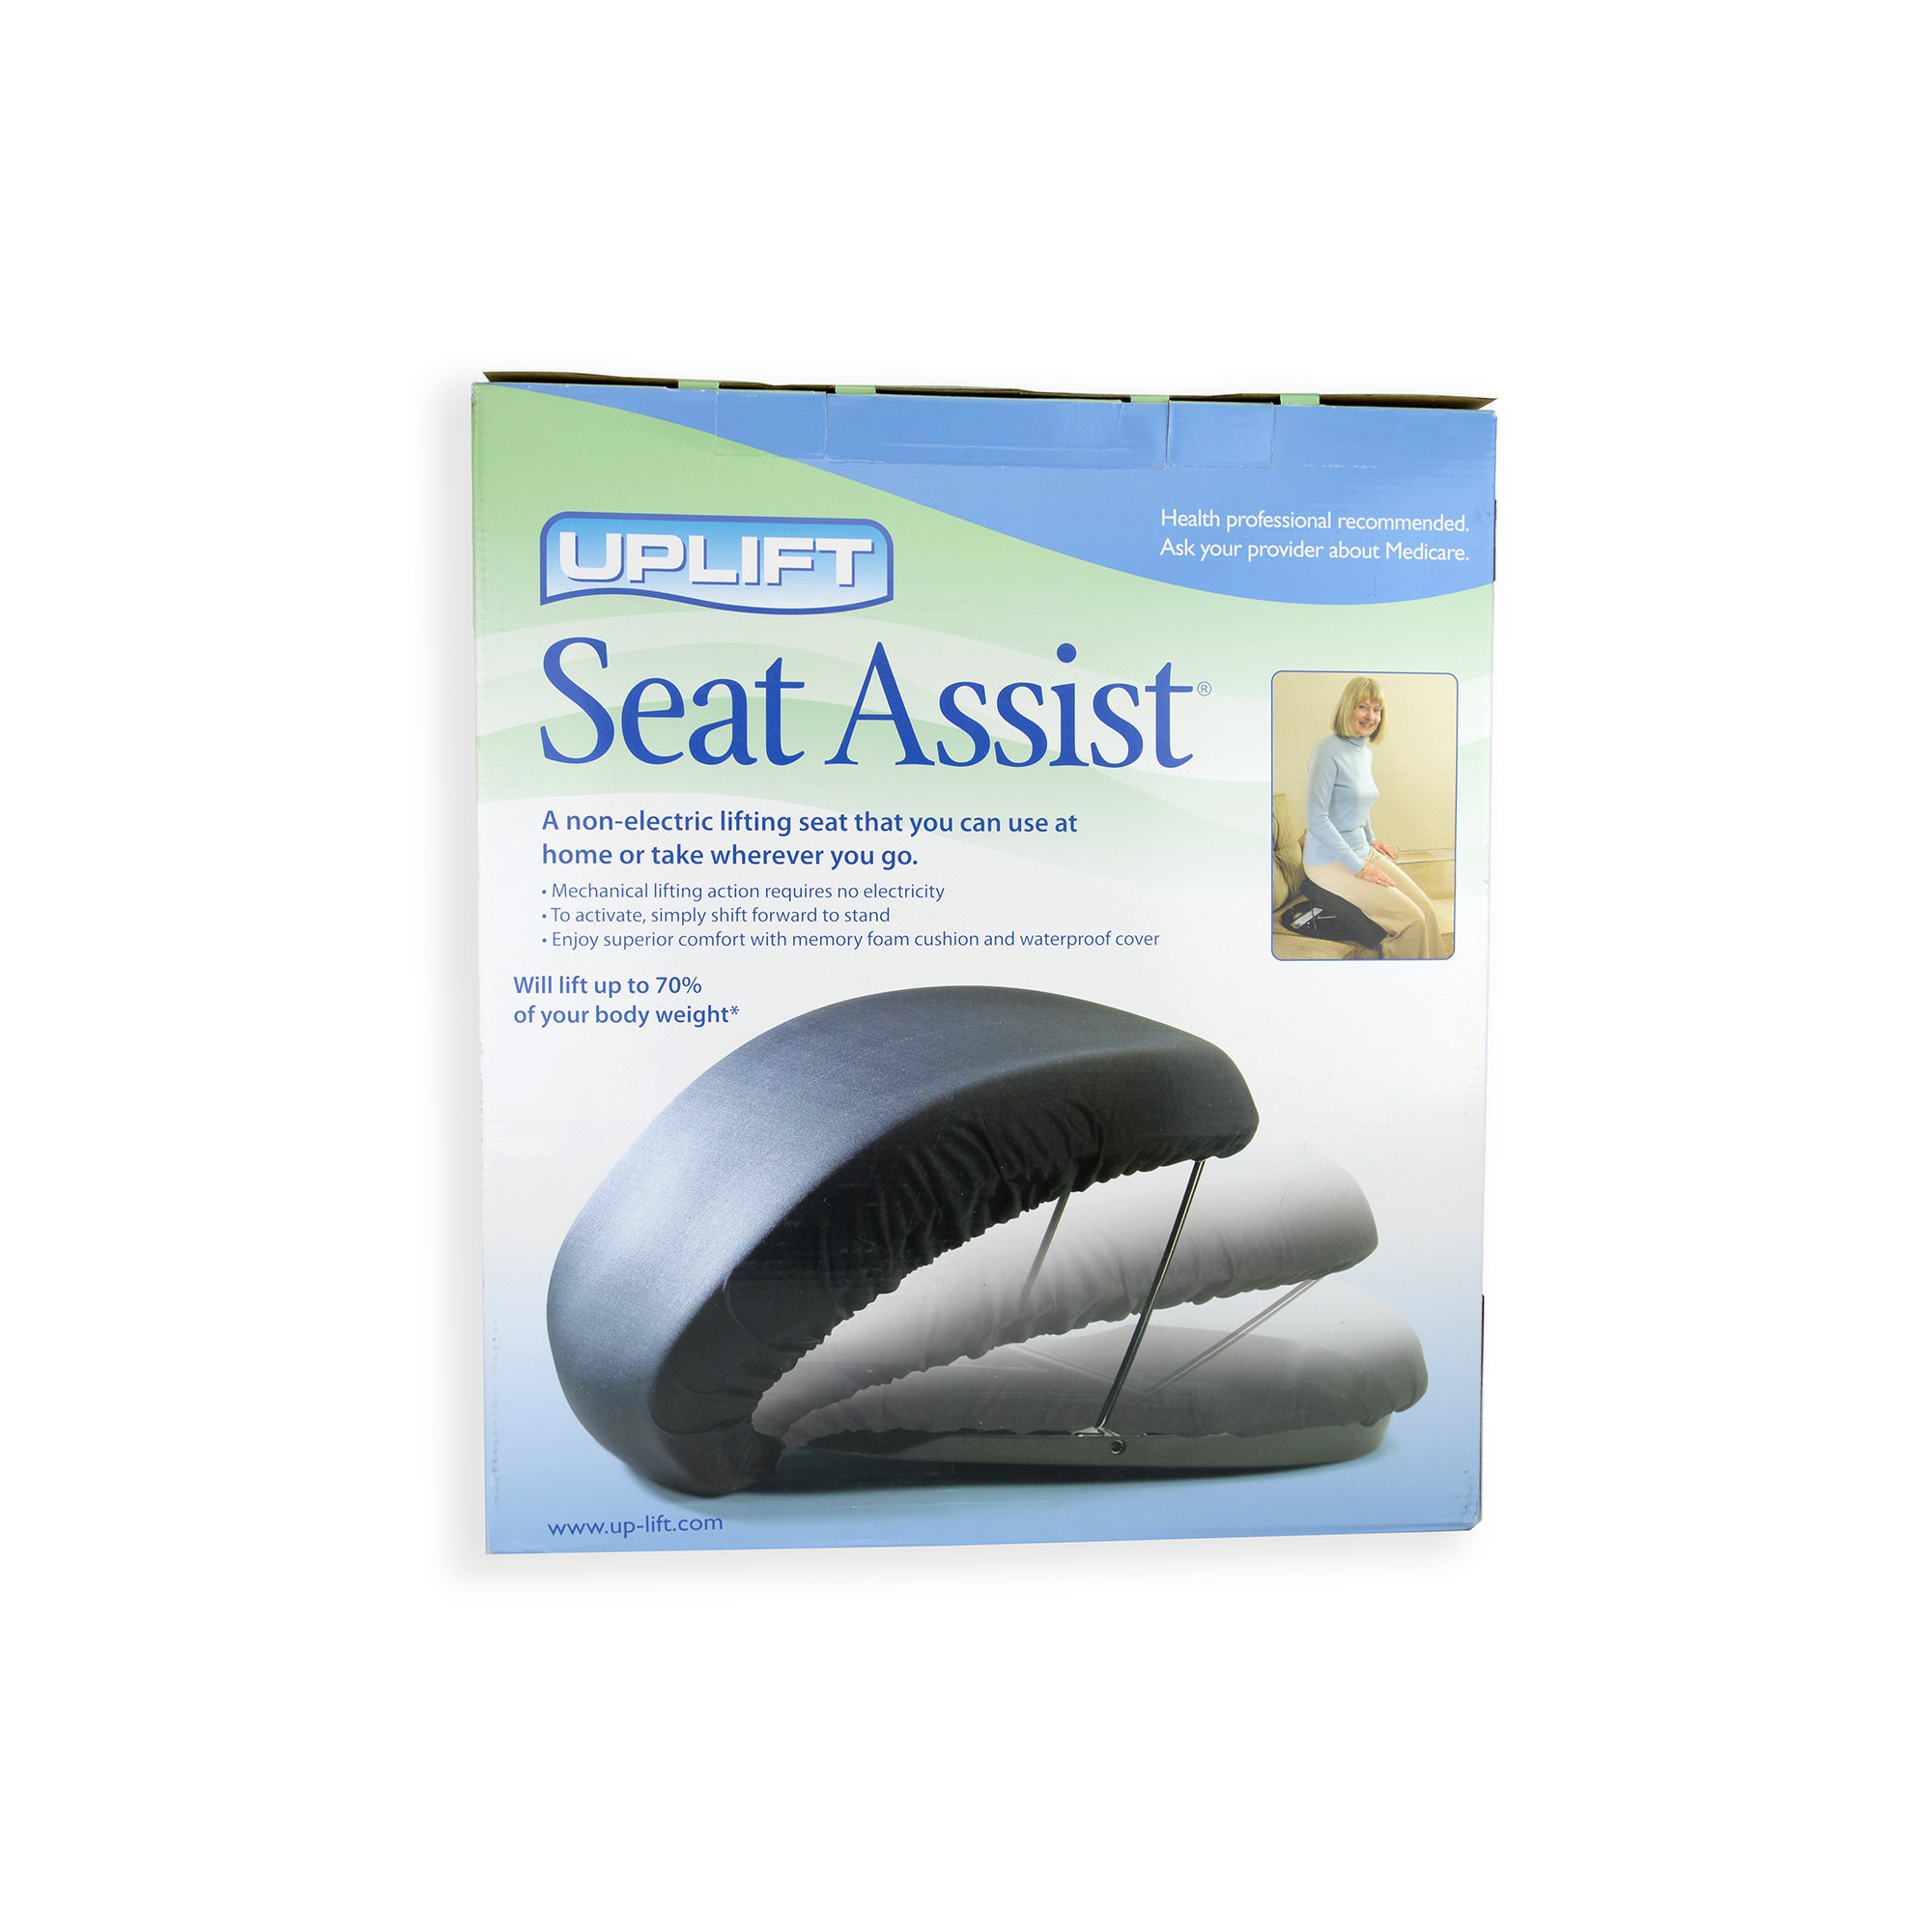 uplift seat assist 80 230 lb med ul100 advocatemeters com